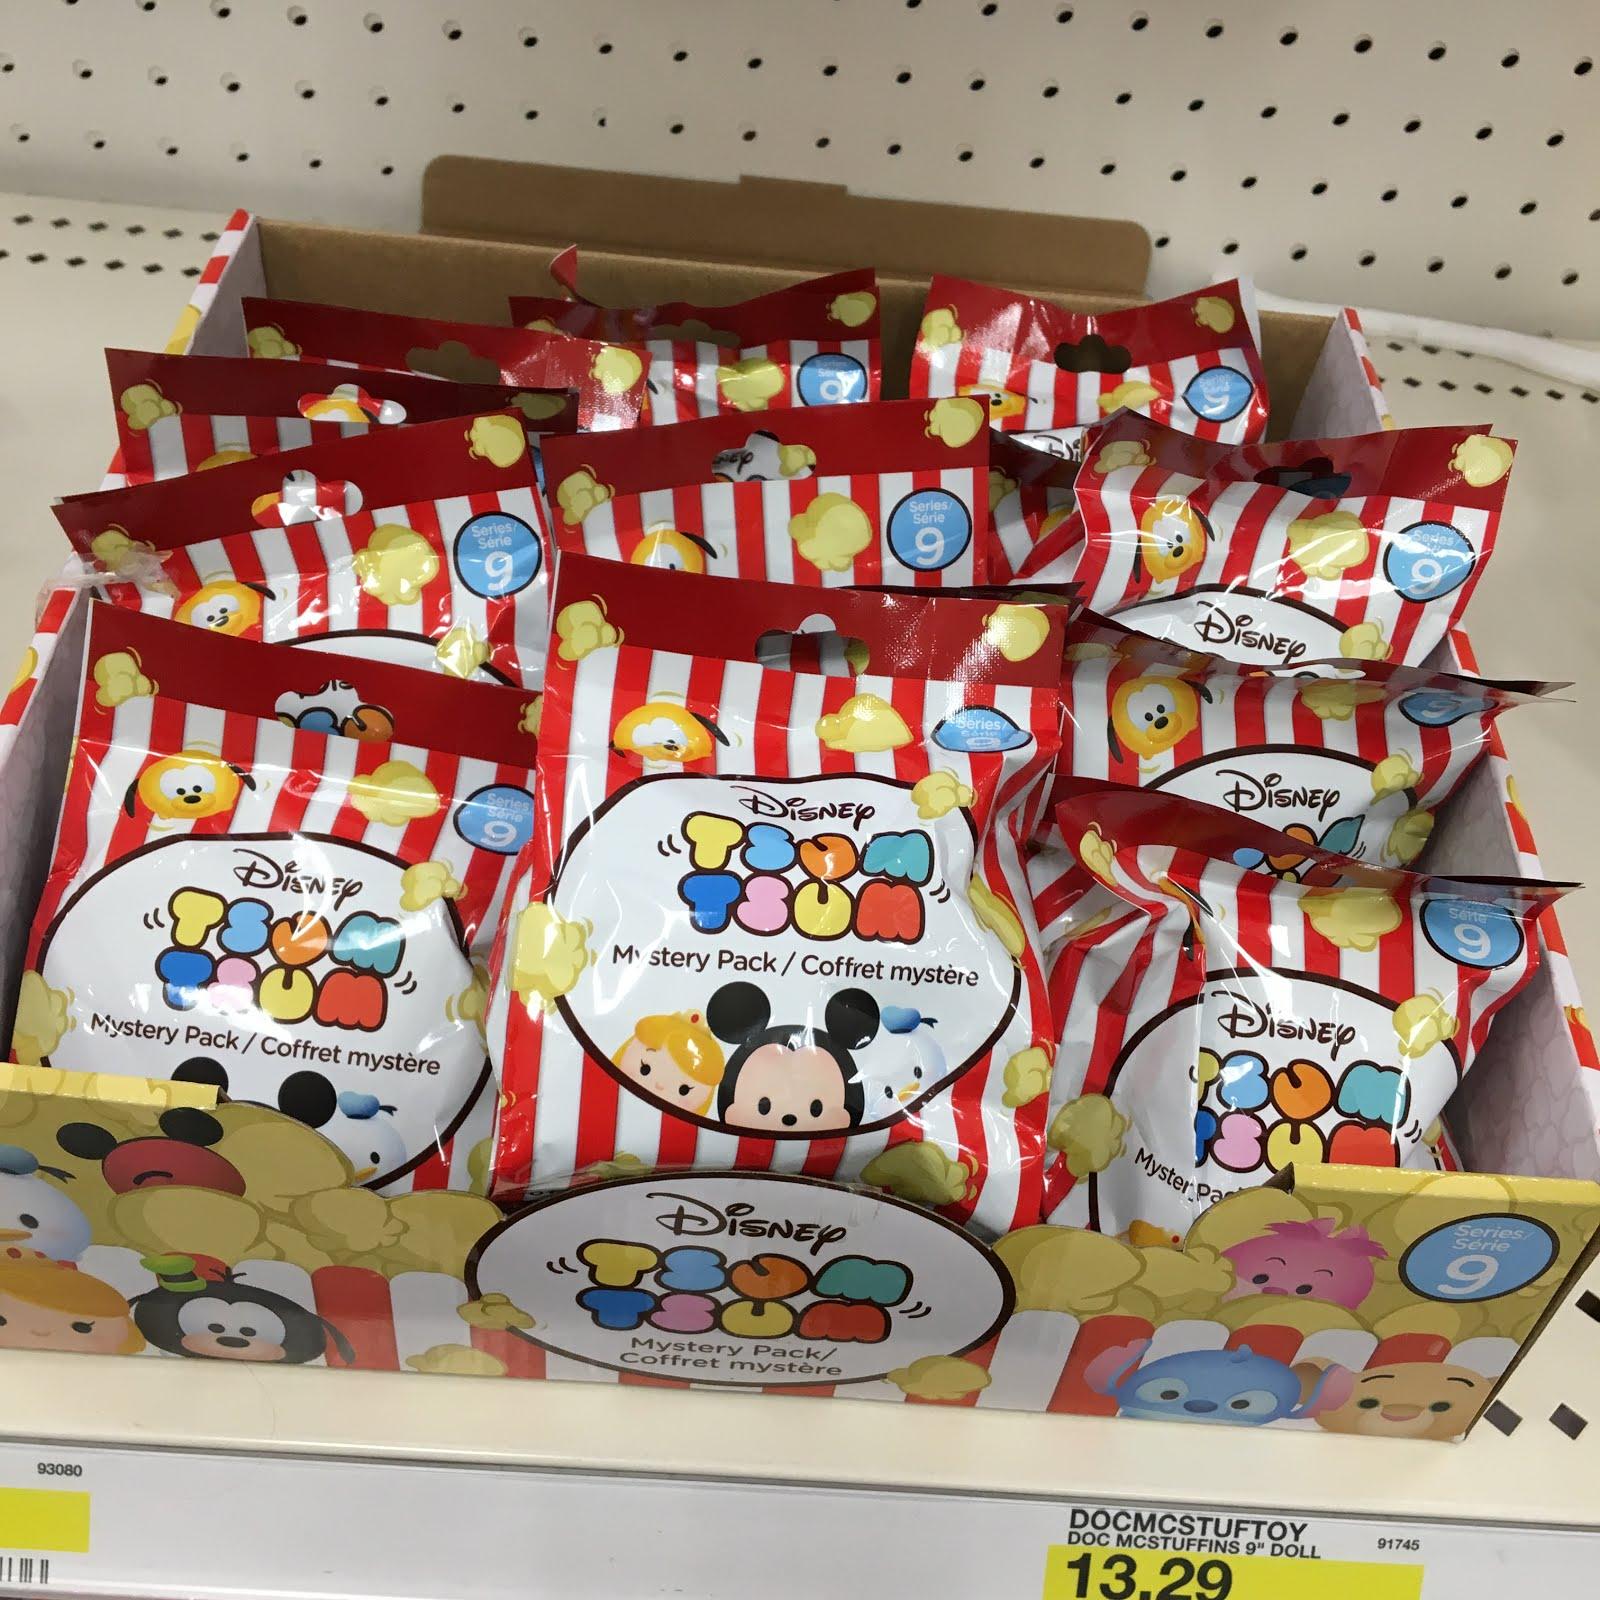 Disney Tsum Tsum Mystery Packs by Jakks Pacific Series 9 Pixar